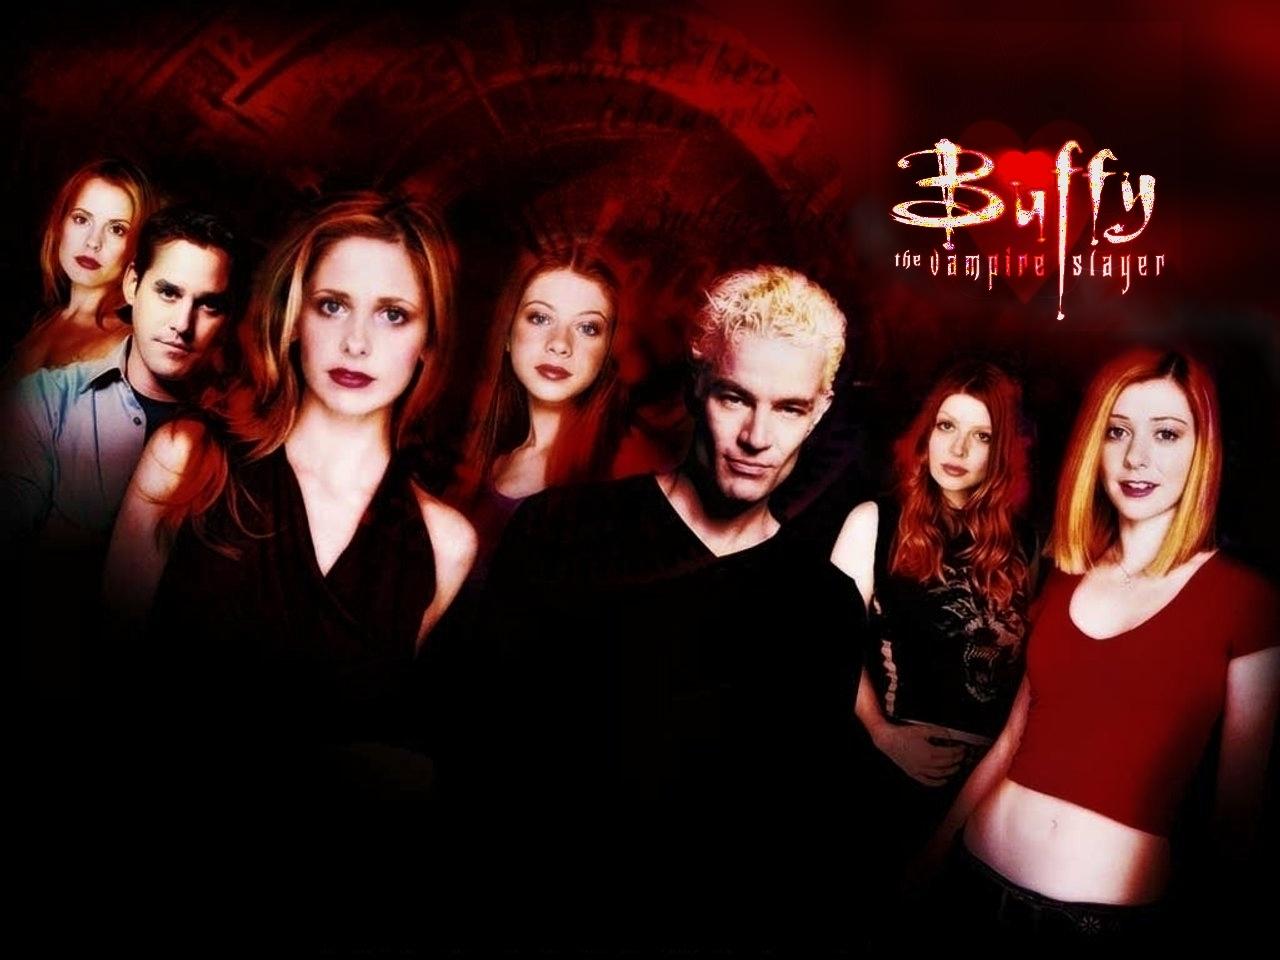 Buffy The Vampire Slayer 1280x800 Wallpaper Ecopetit Cat